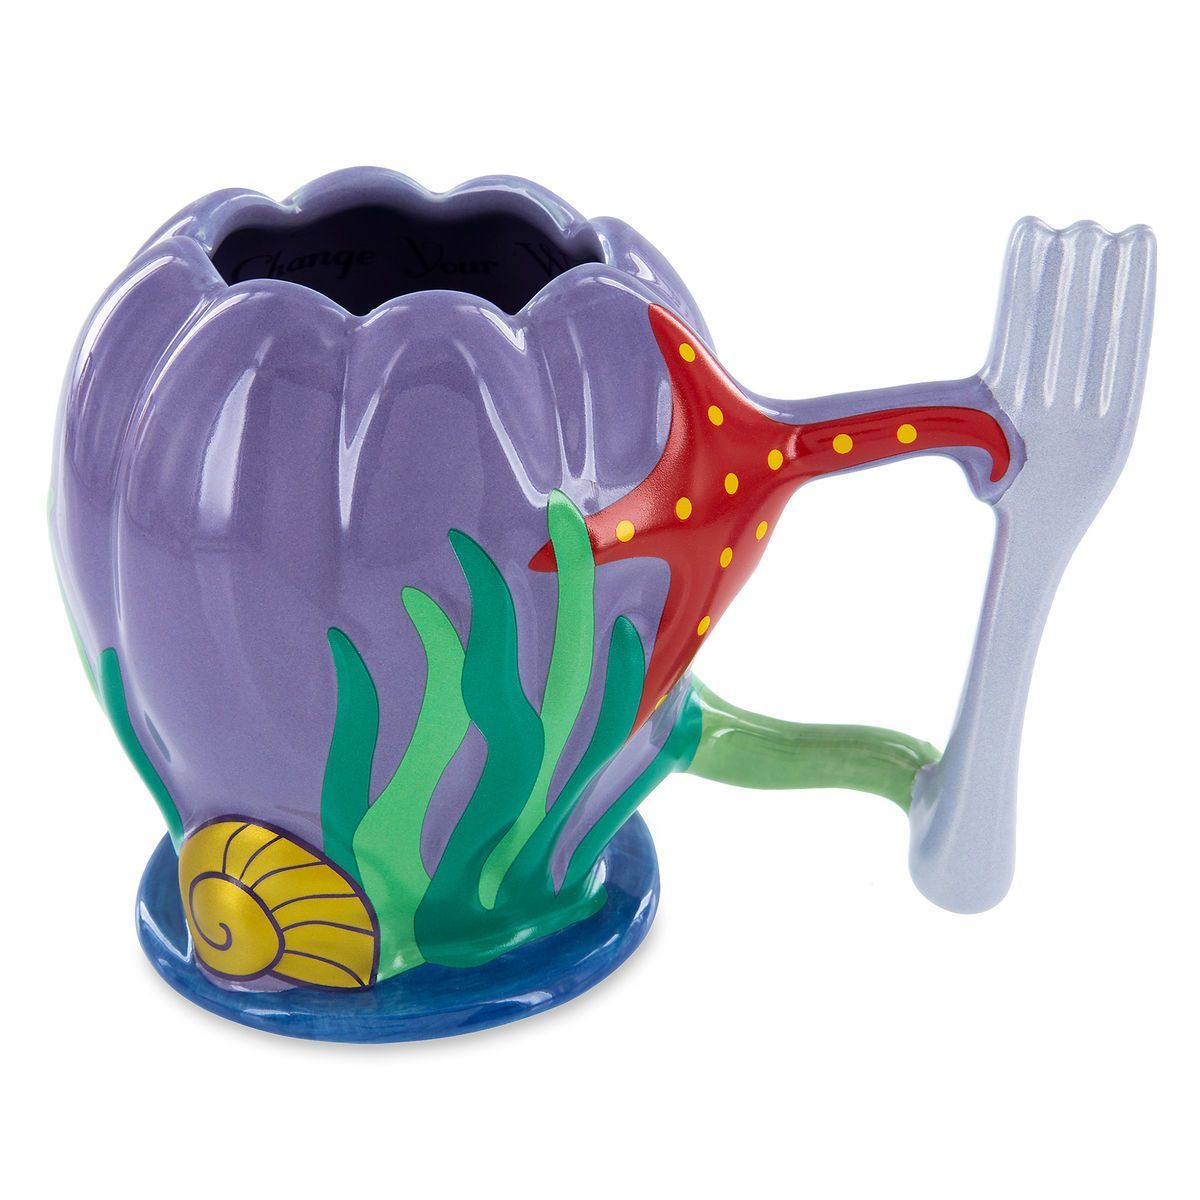 Disney Parks The Little Mermaid Ariel Dinglehopper Handle Ceramic Mug Walmart Com Disney Coffee Mugs Disney Mugs Disney Princess Mugs